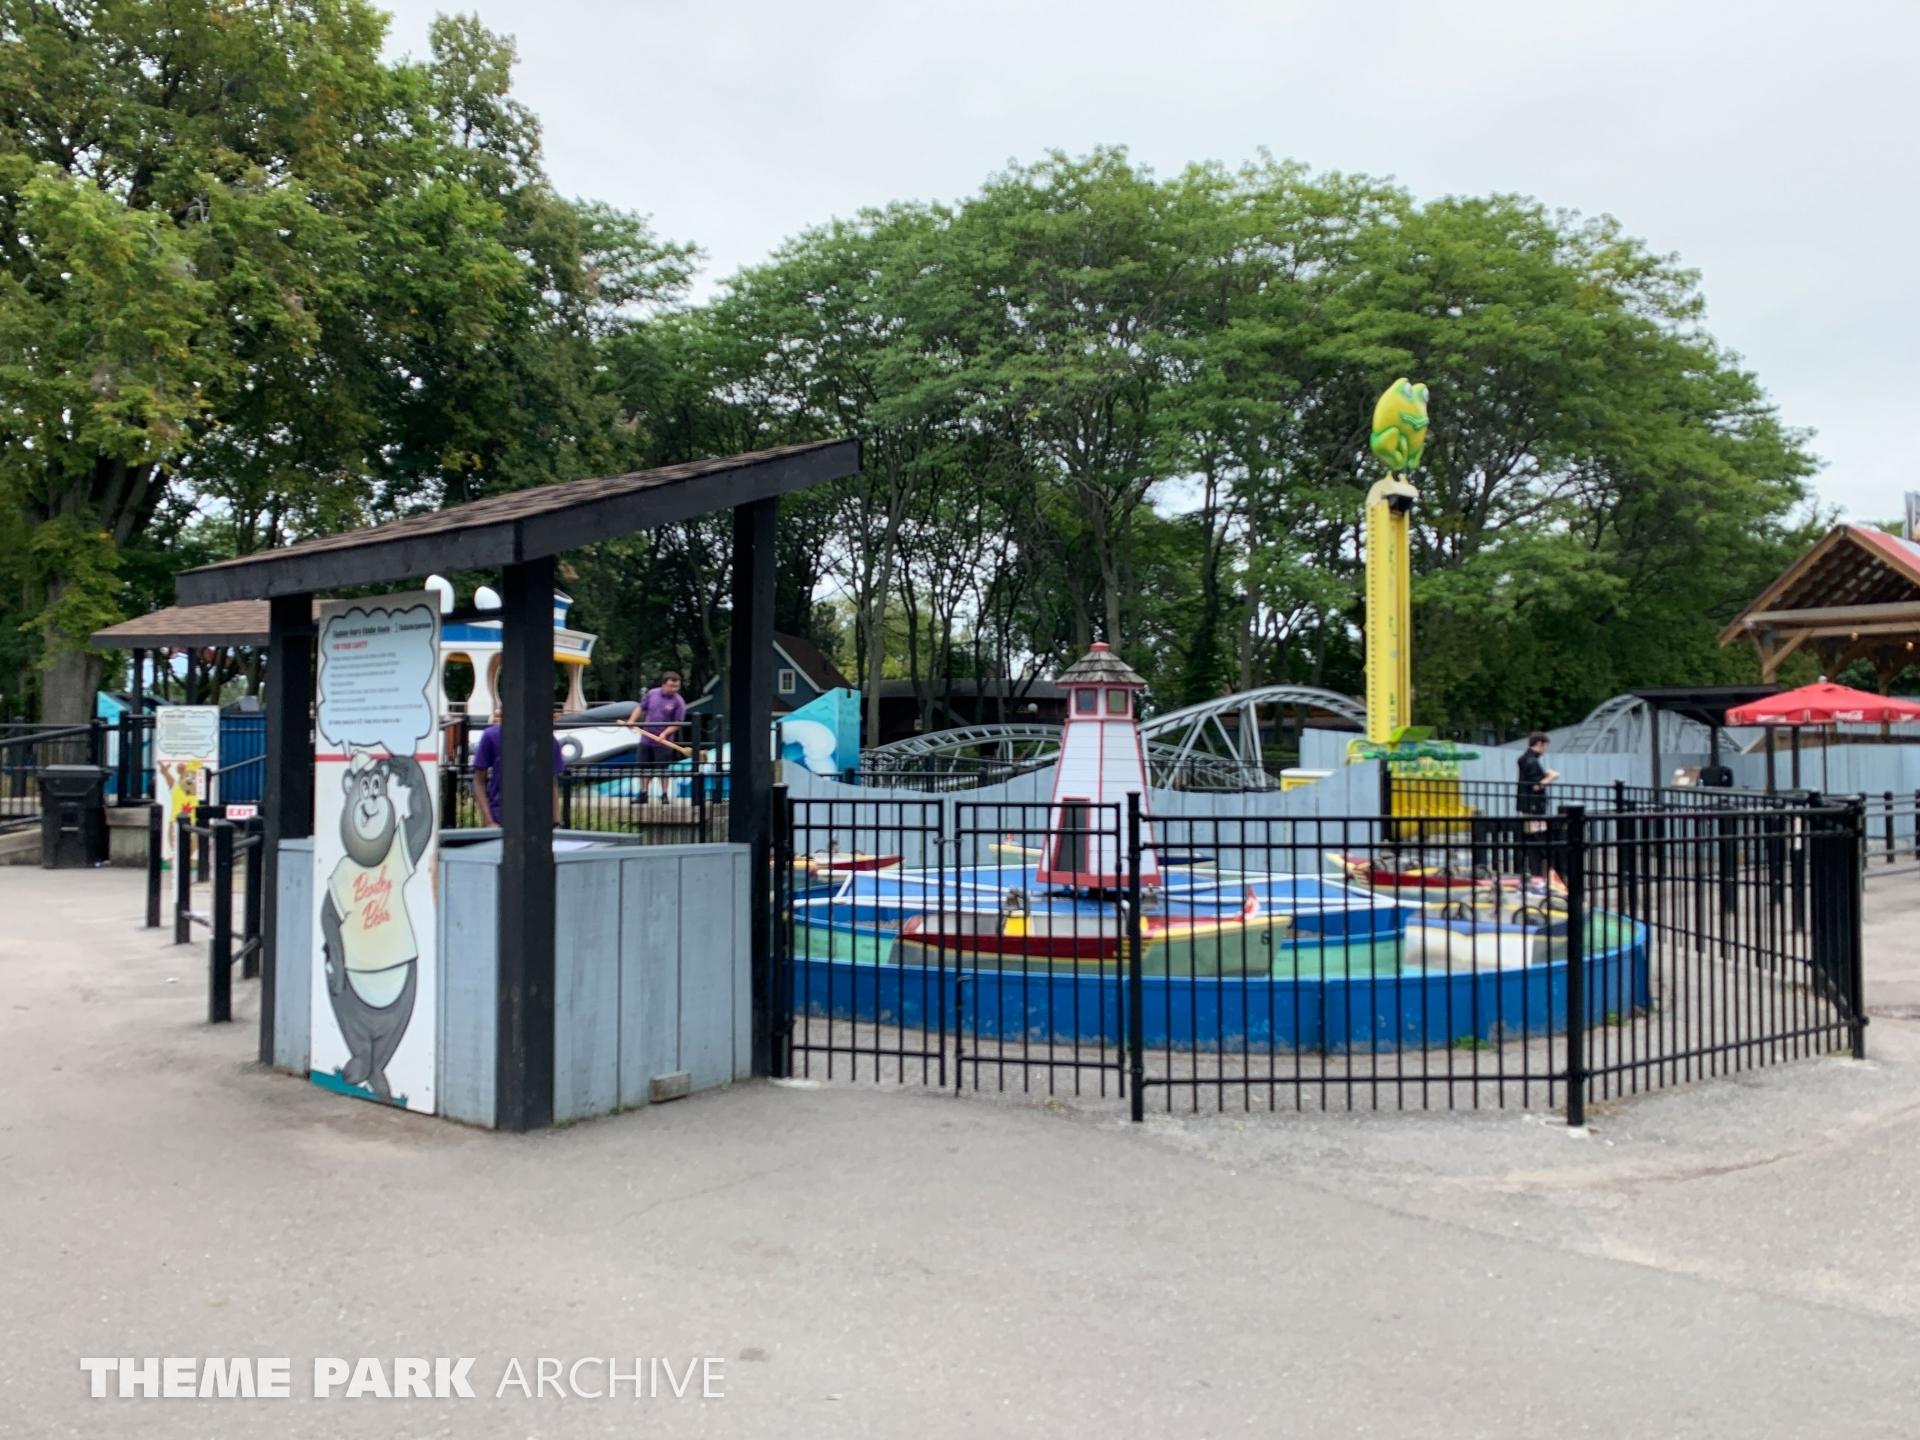 Kiddie Boat at Centreville Amusement Park